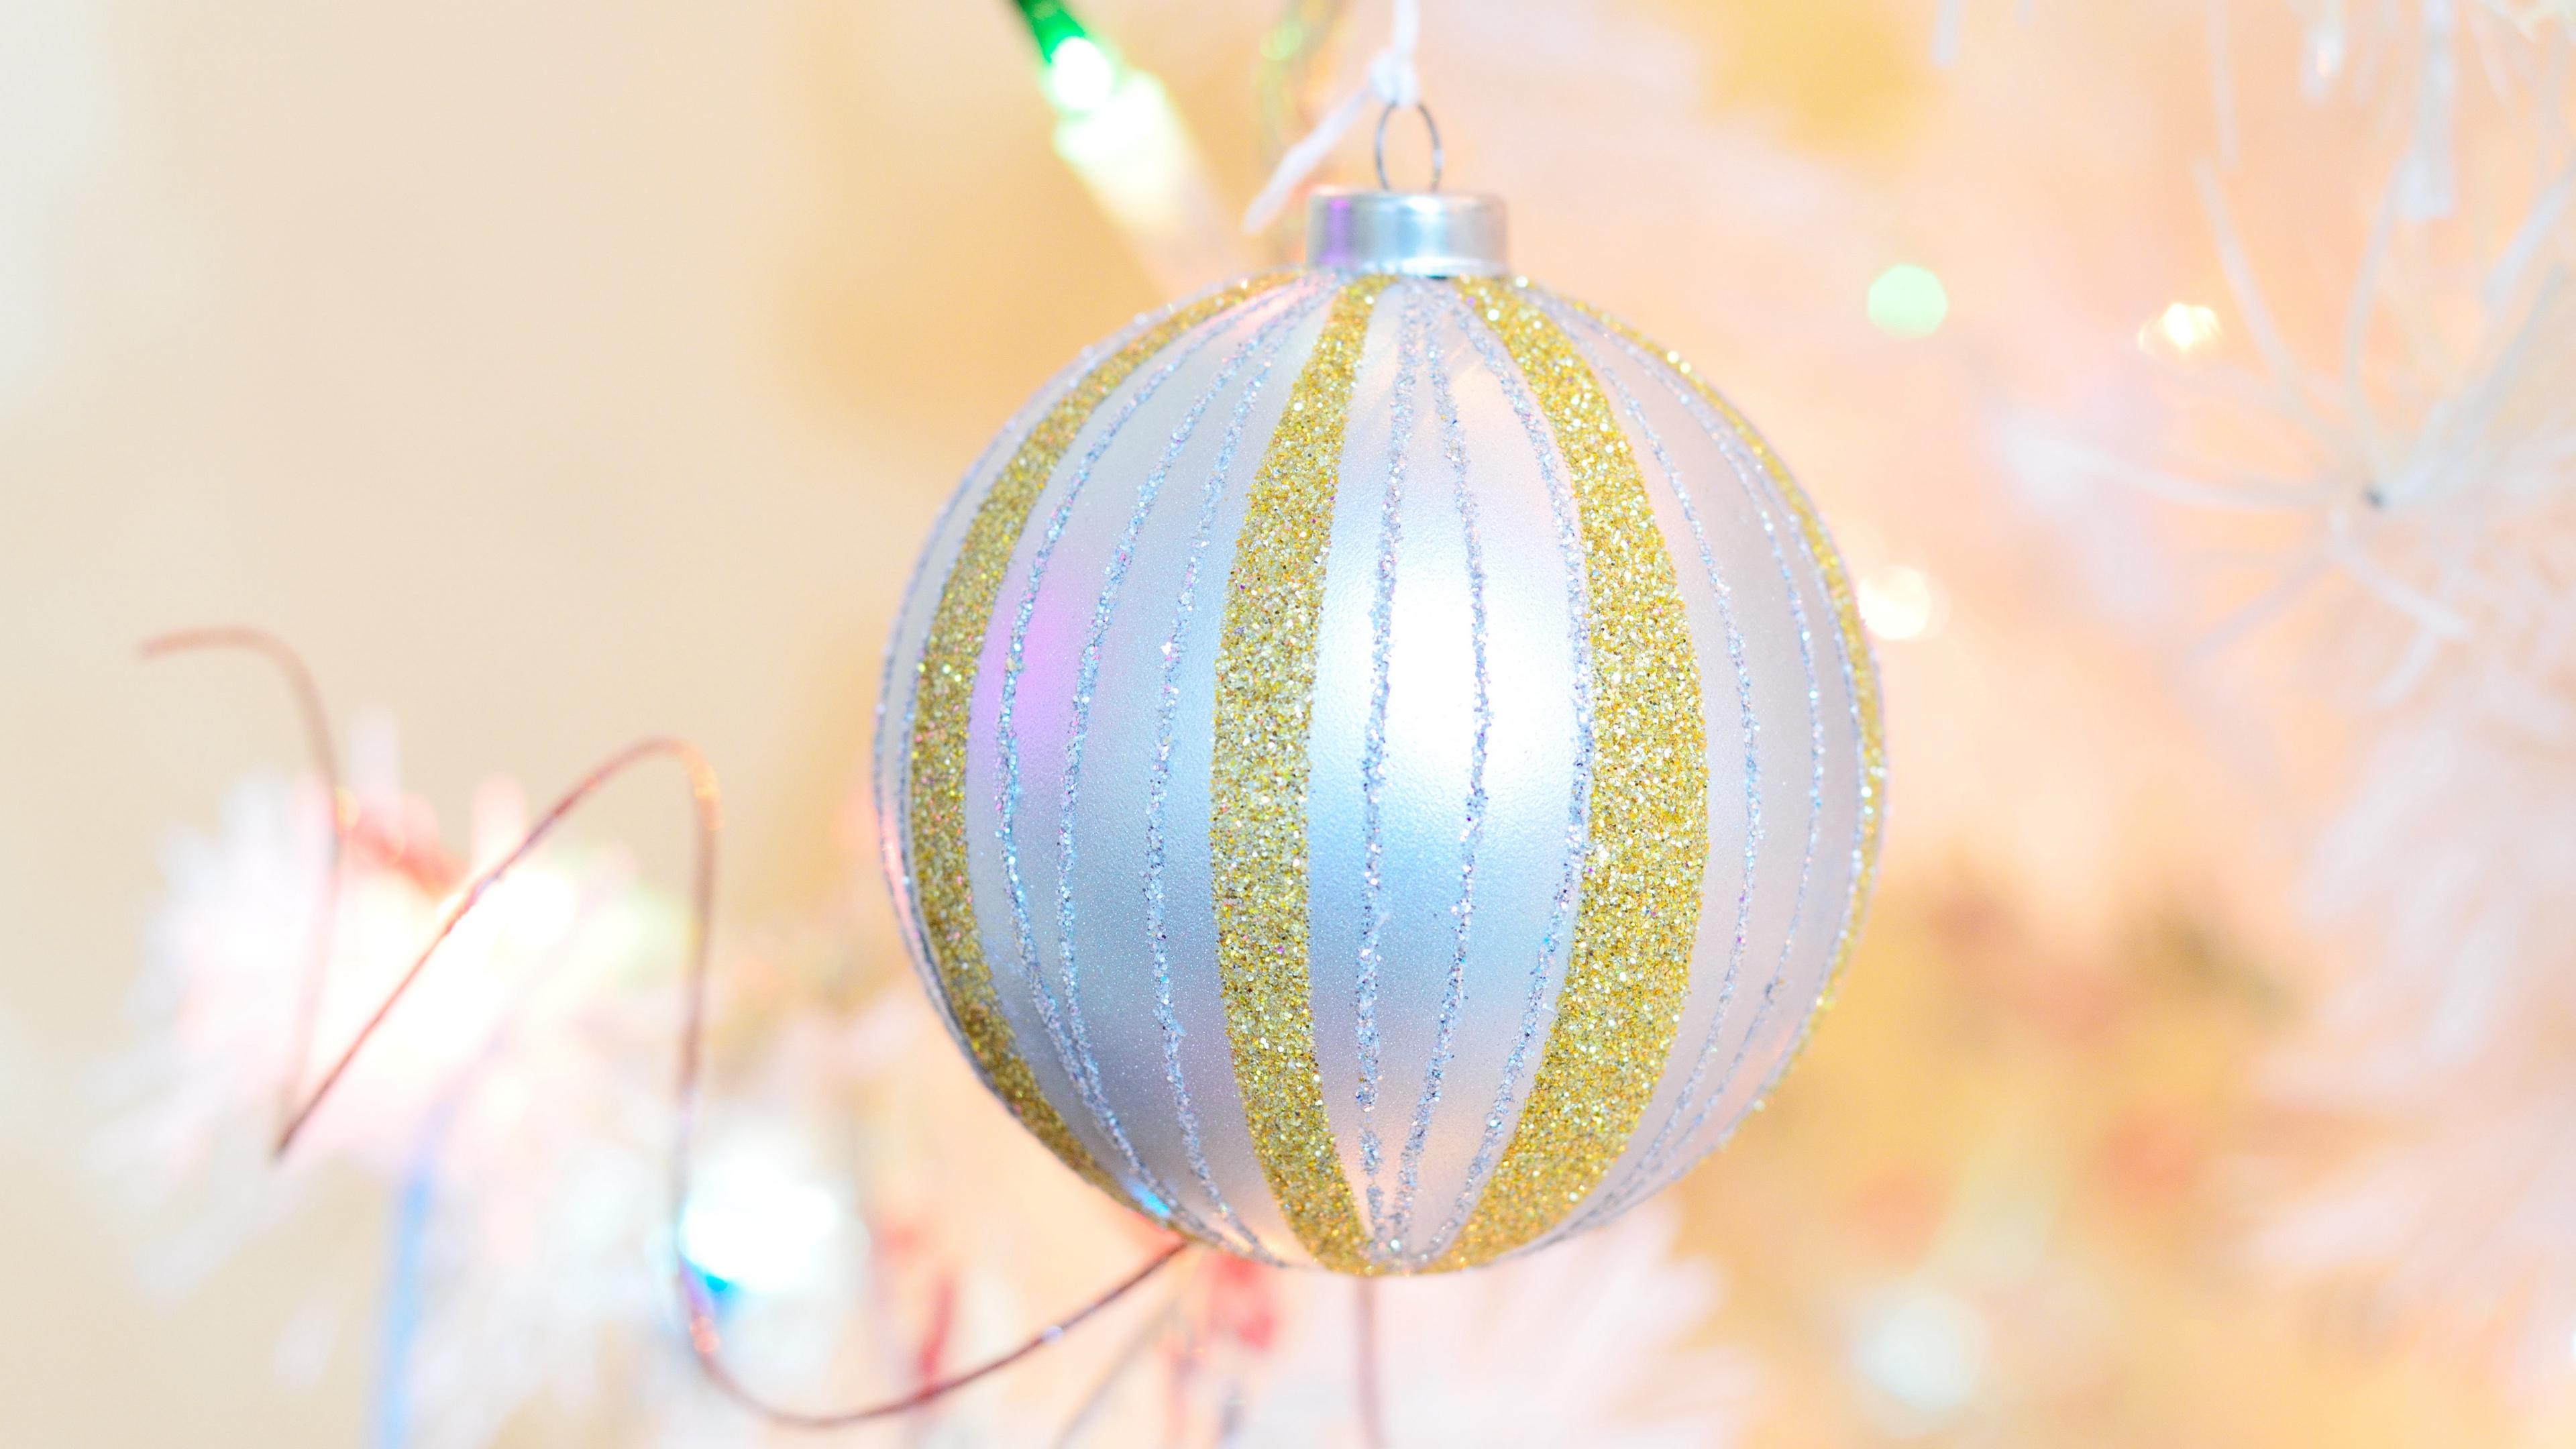 christmas decorations christmas new year 4k 1538344677 - christmas decorations, christmas, new year 4k - new year, christmas decorations, Christmas